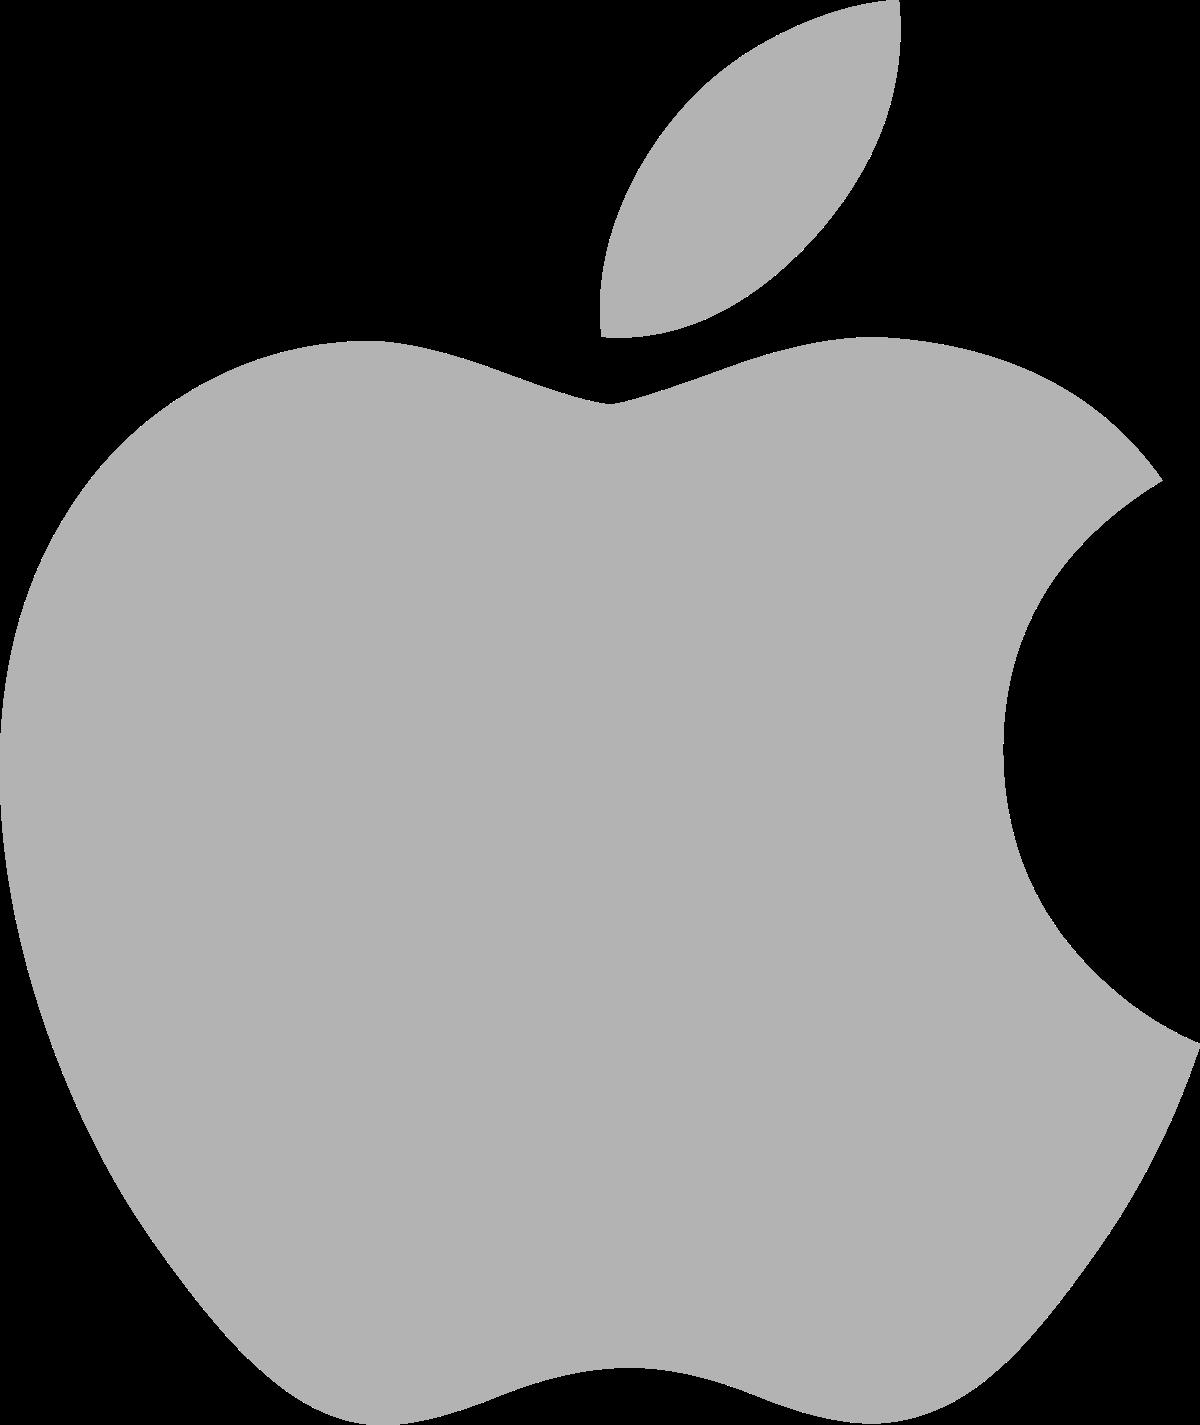 Логотип apple - логотип, лого, apple